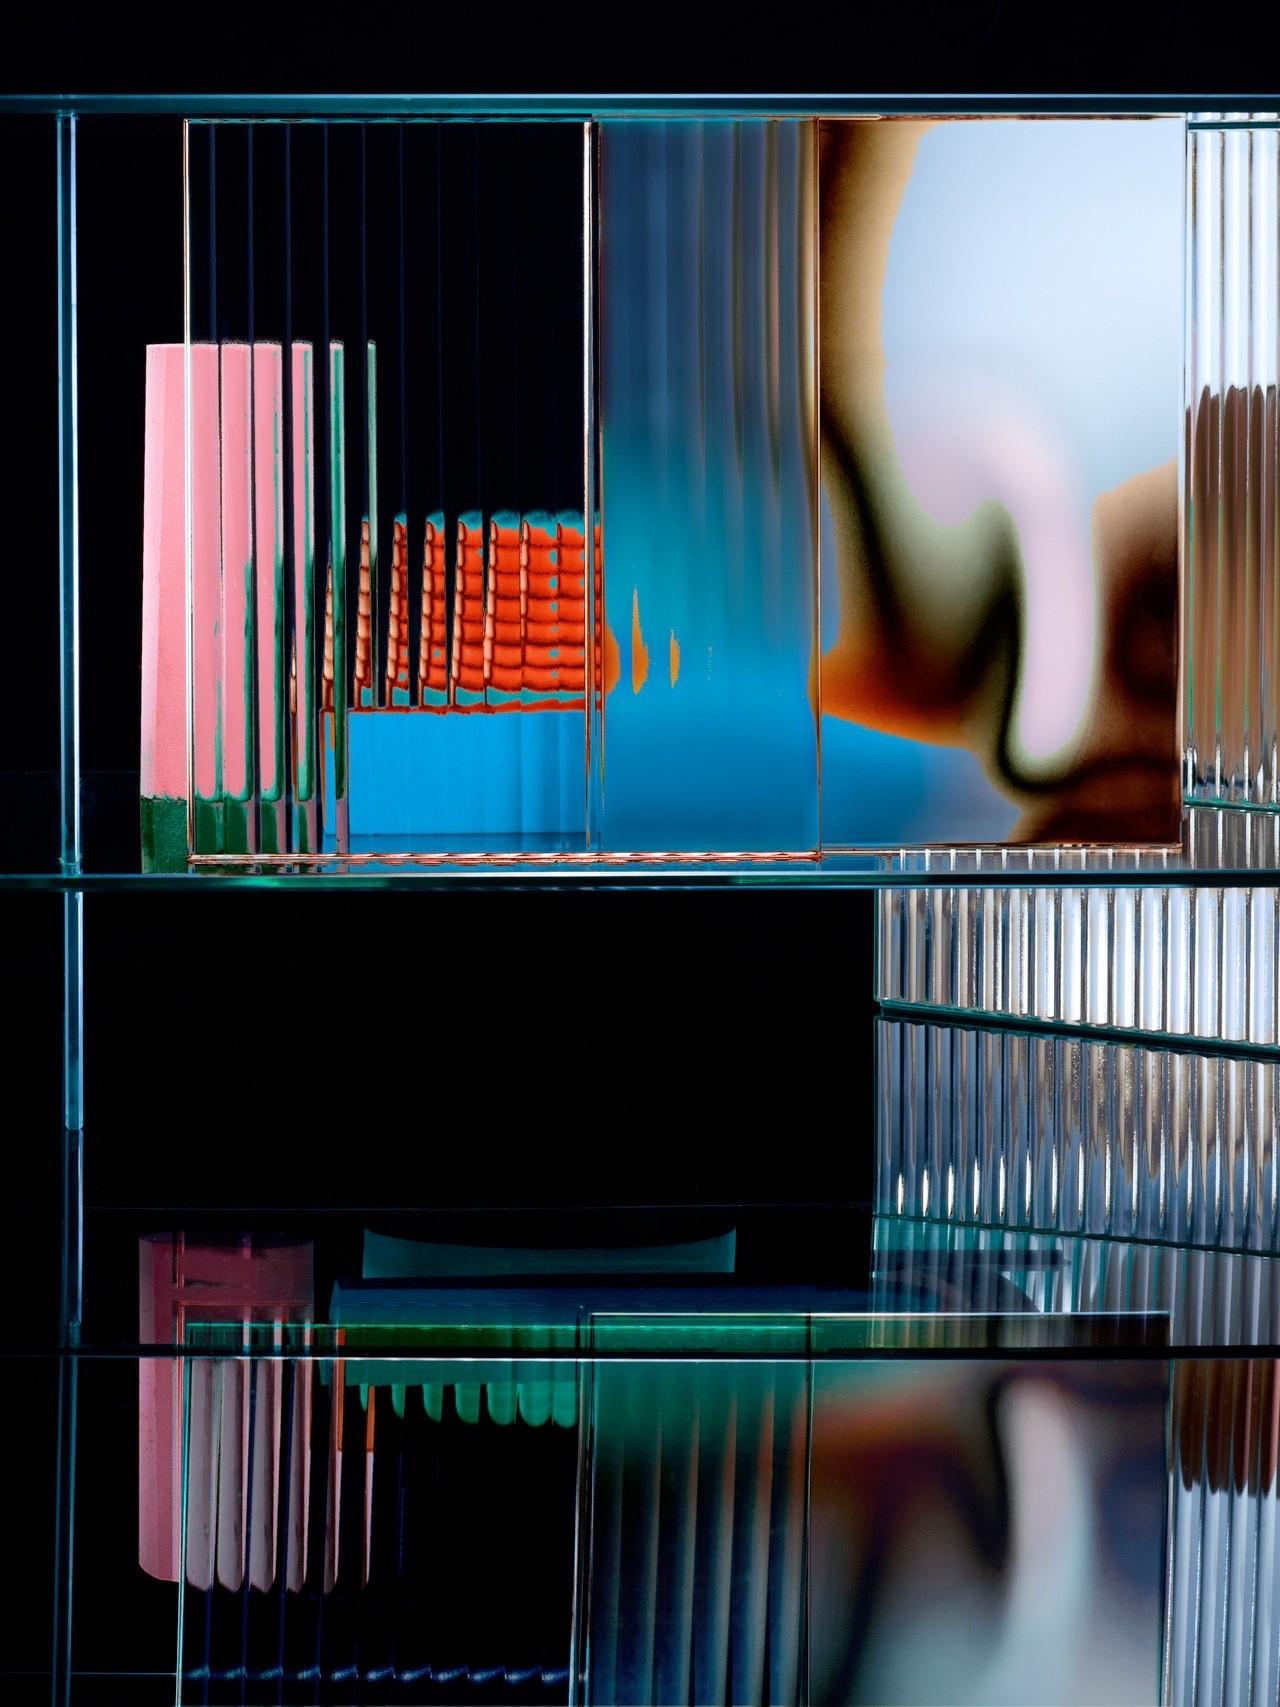 Collage   Repetition   Colour   Conceptual   Modern   Elegant  